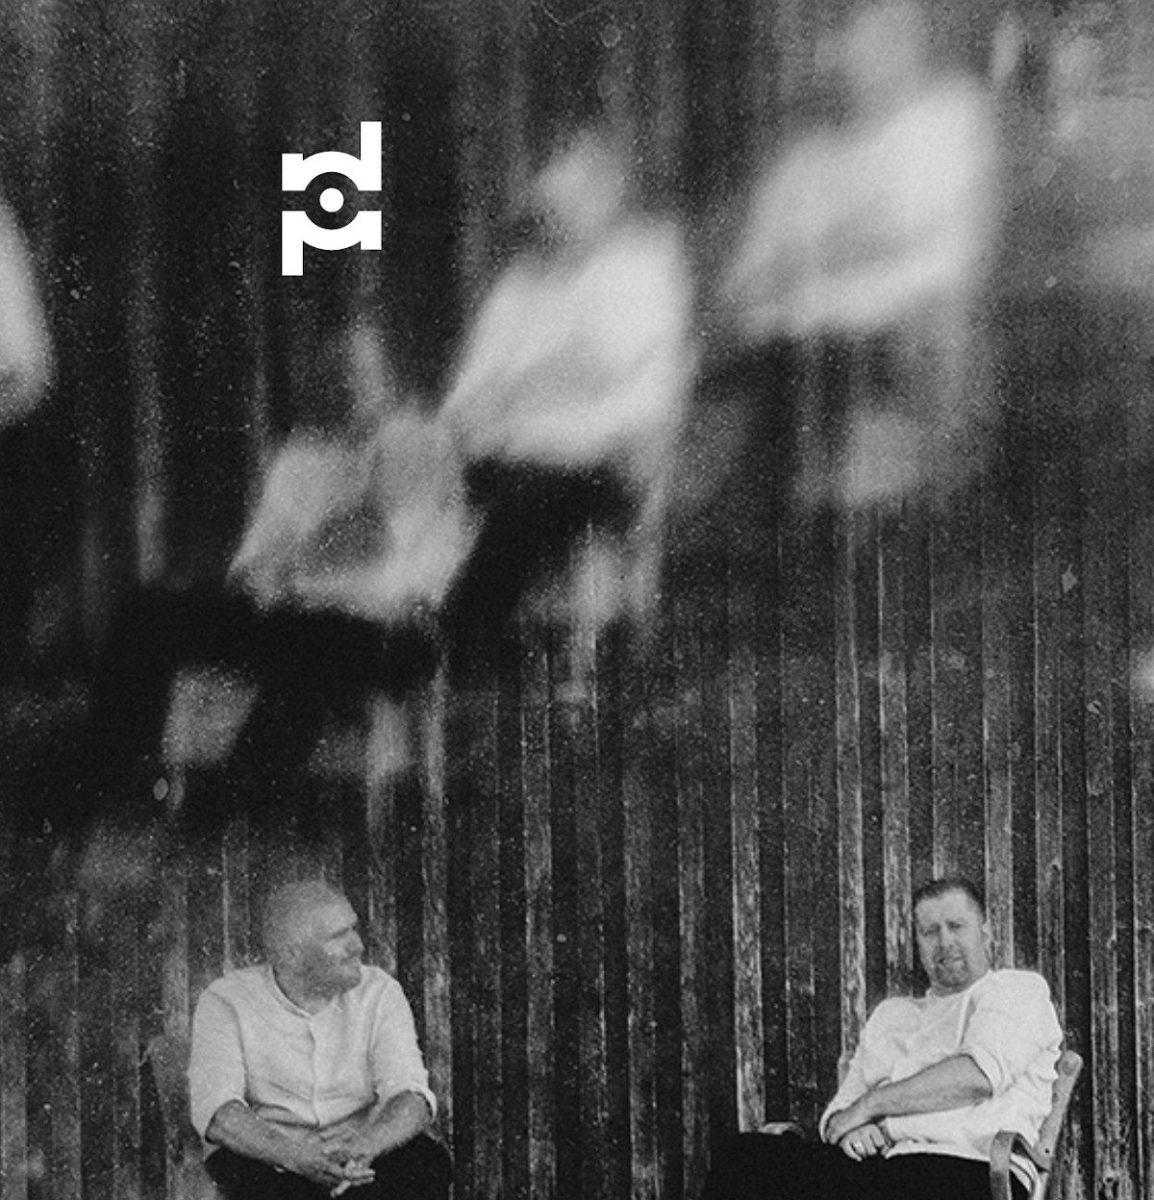 Apoptygma Berzerk side-project Piston Damp releases second single on February 1st: 'Loose Ends'